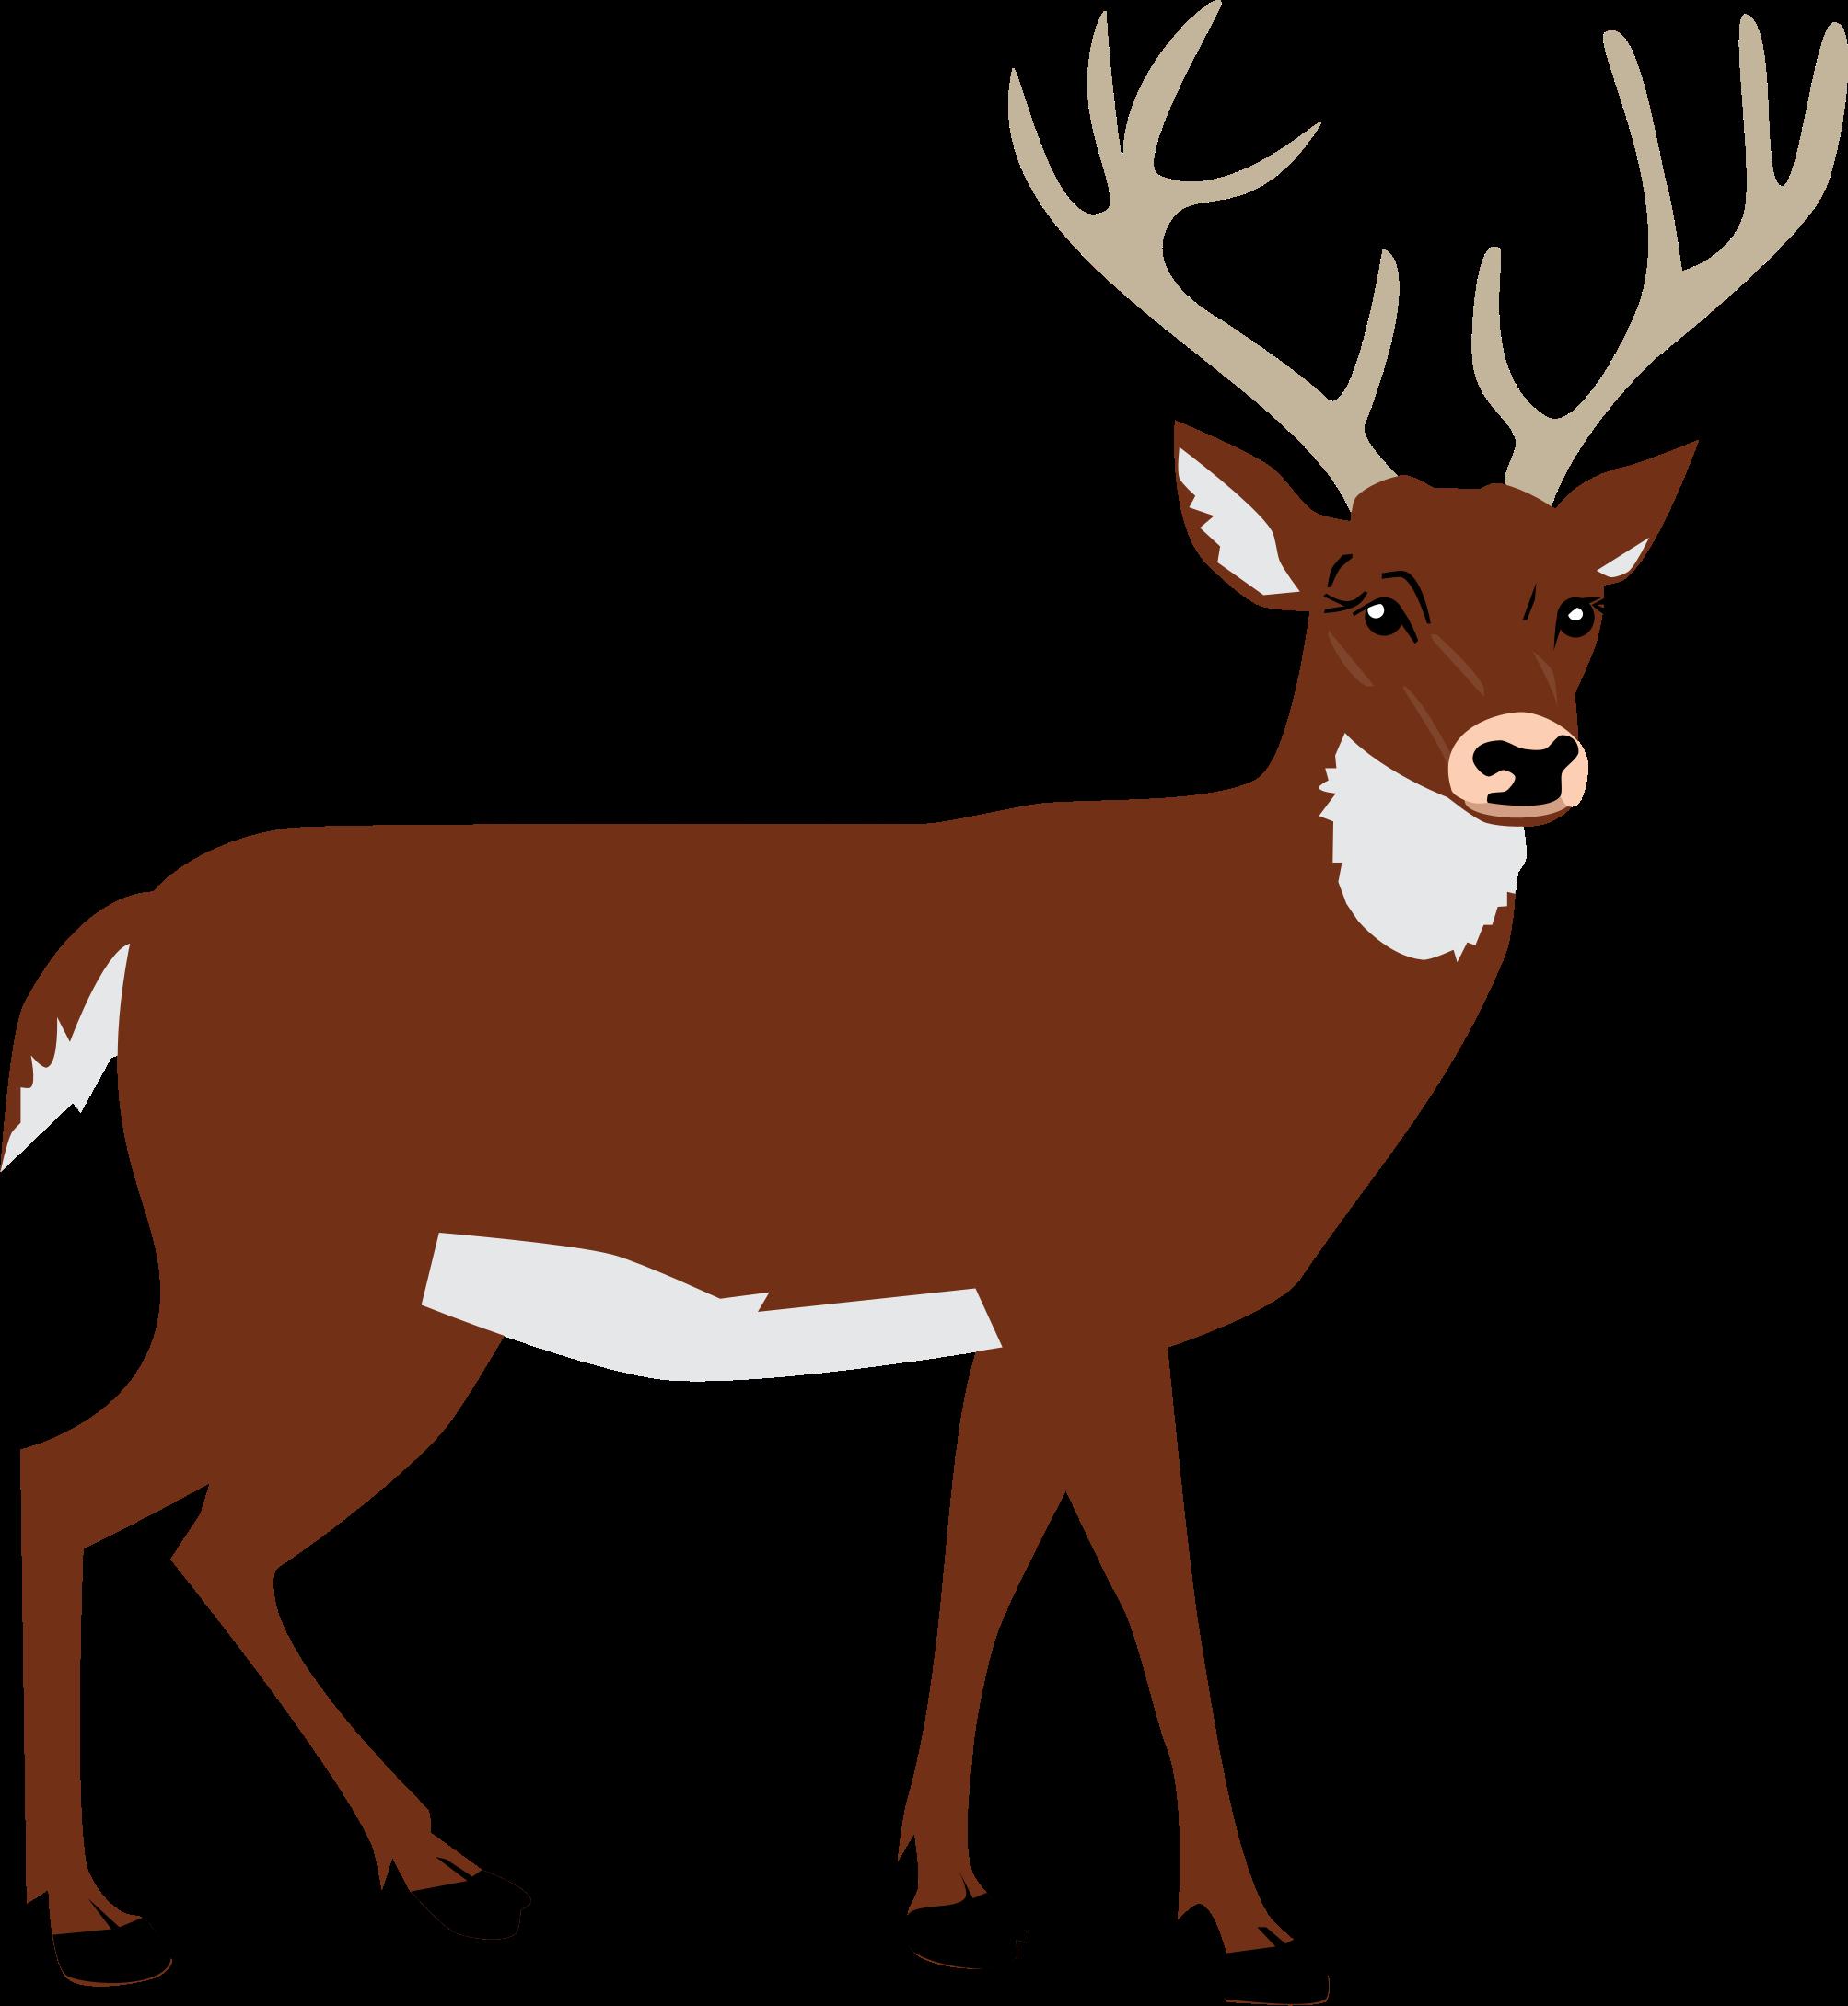 Deer clipart deer meat. Bclipart male deerbclipart animals